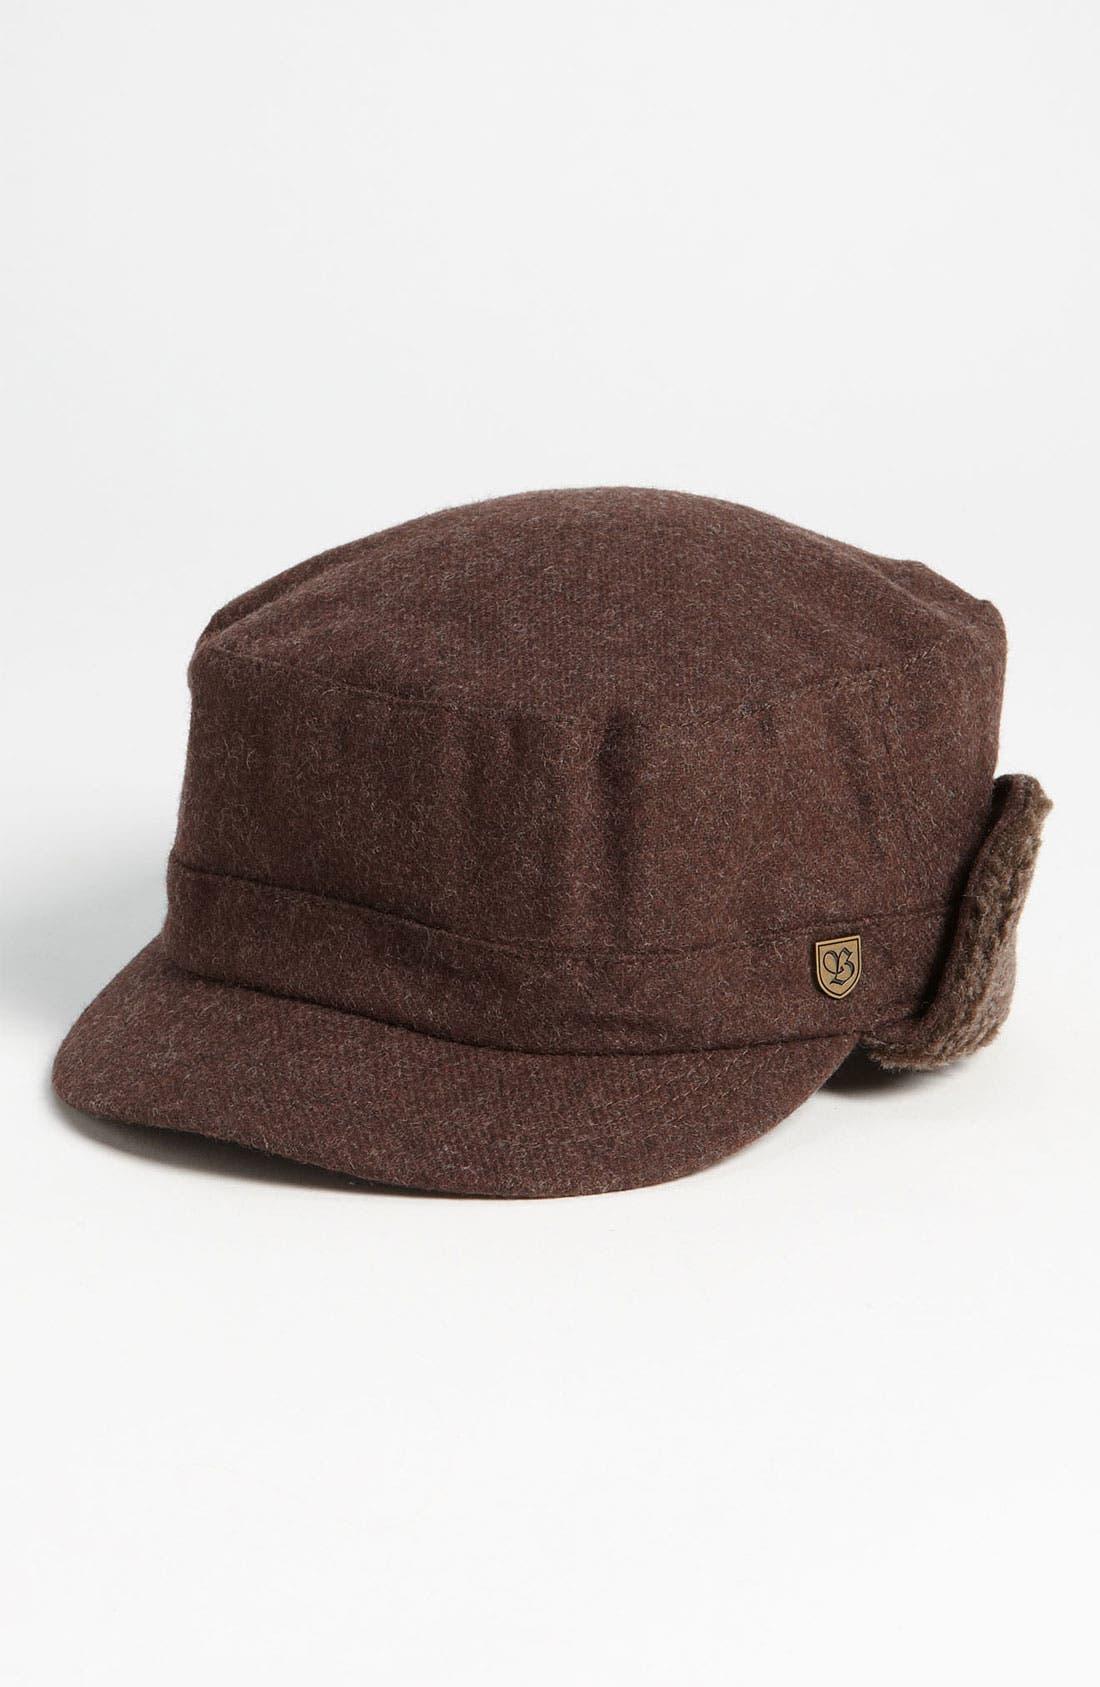 Alternate Image 1 Selected - Brixton 'Lodge' Military Cap